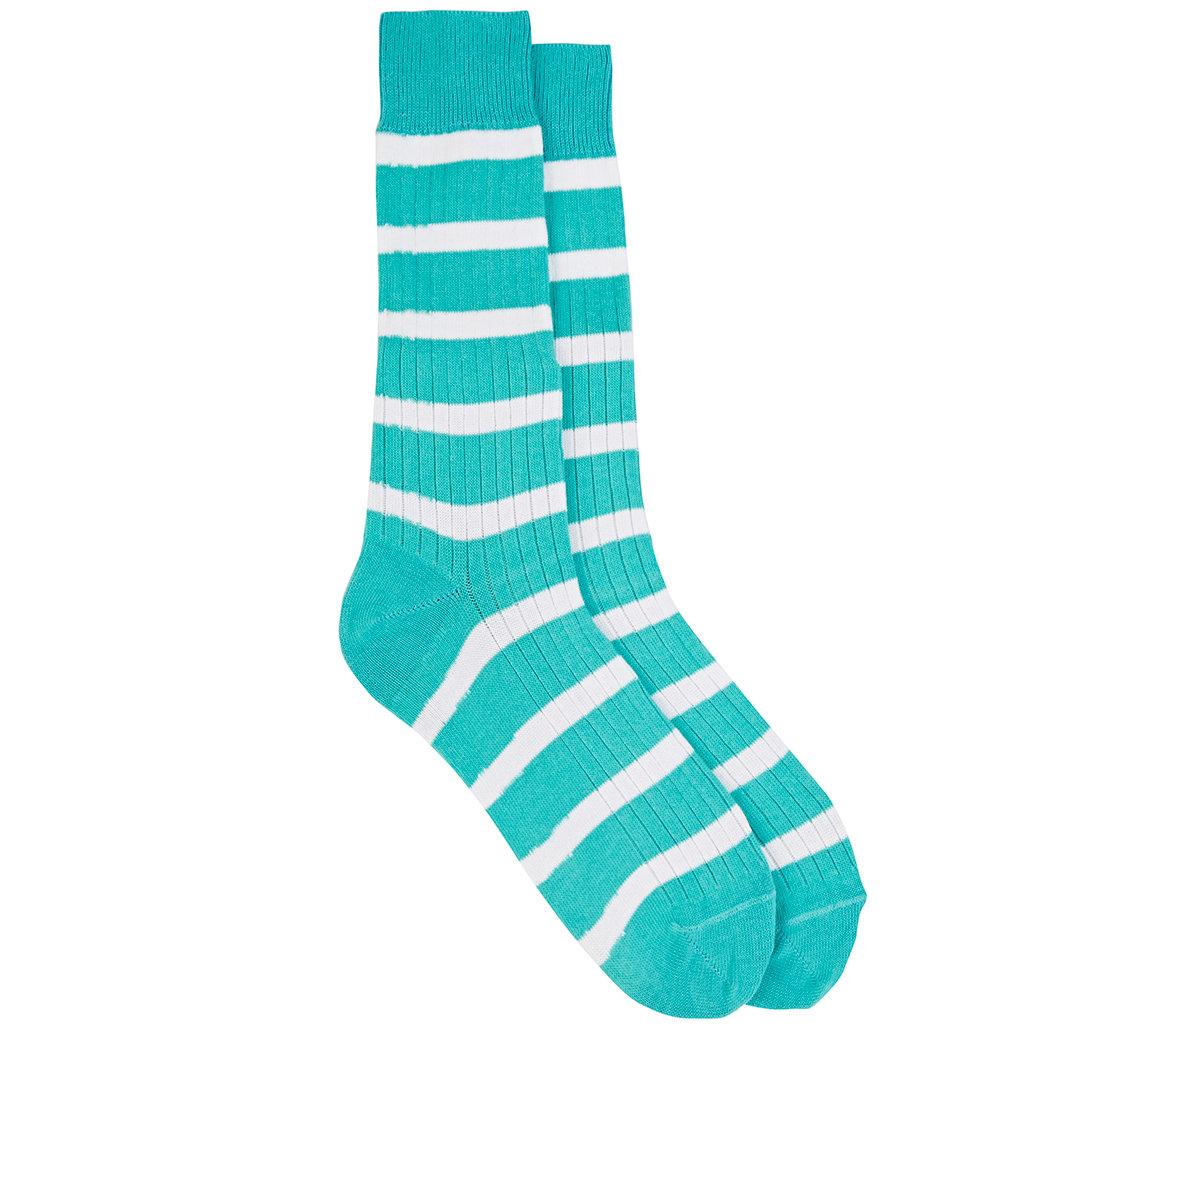 Green Rugby Socks: Barneys New York Men's Rugby-striped Mid-calf Socks In